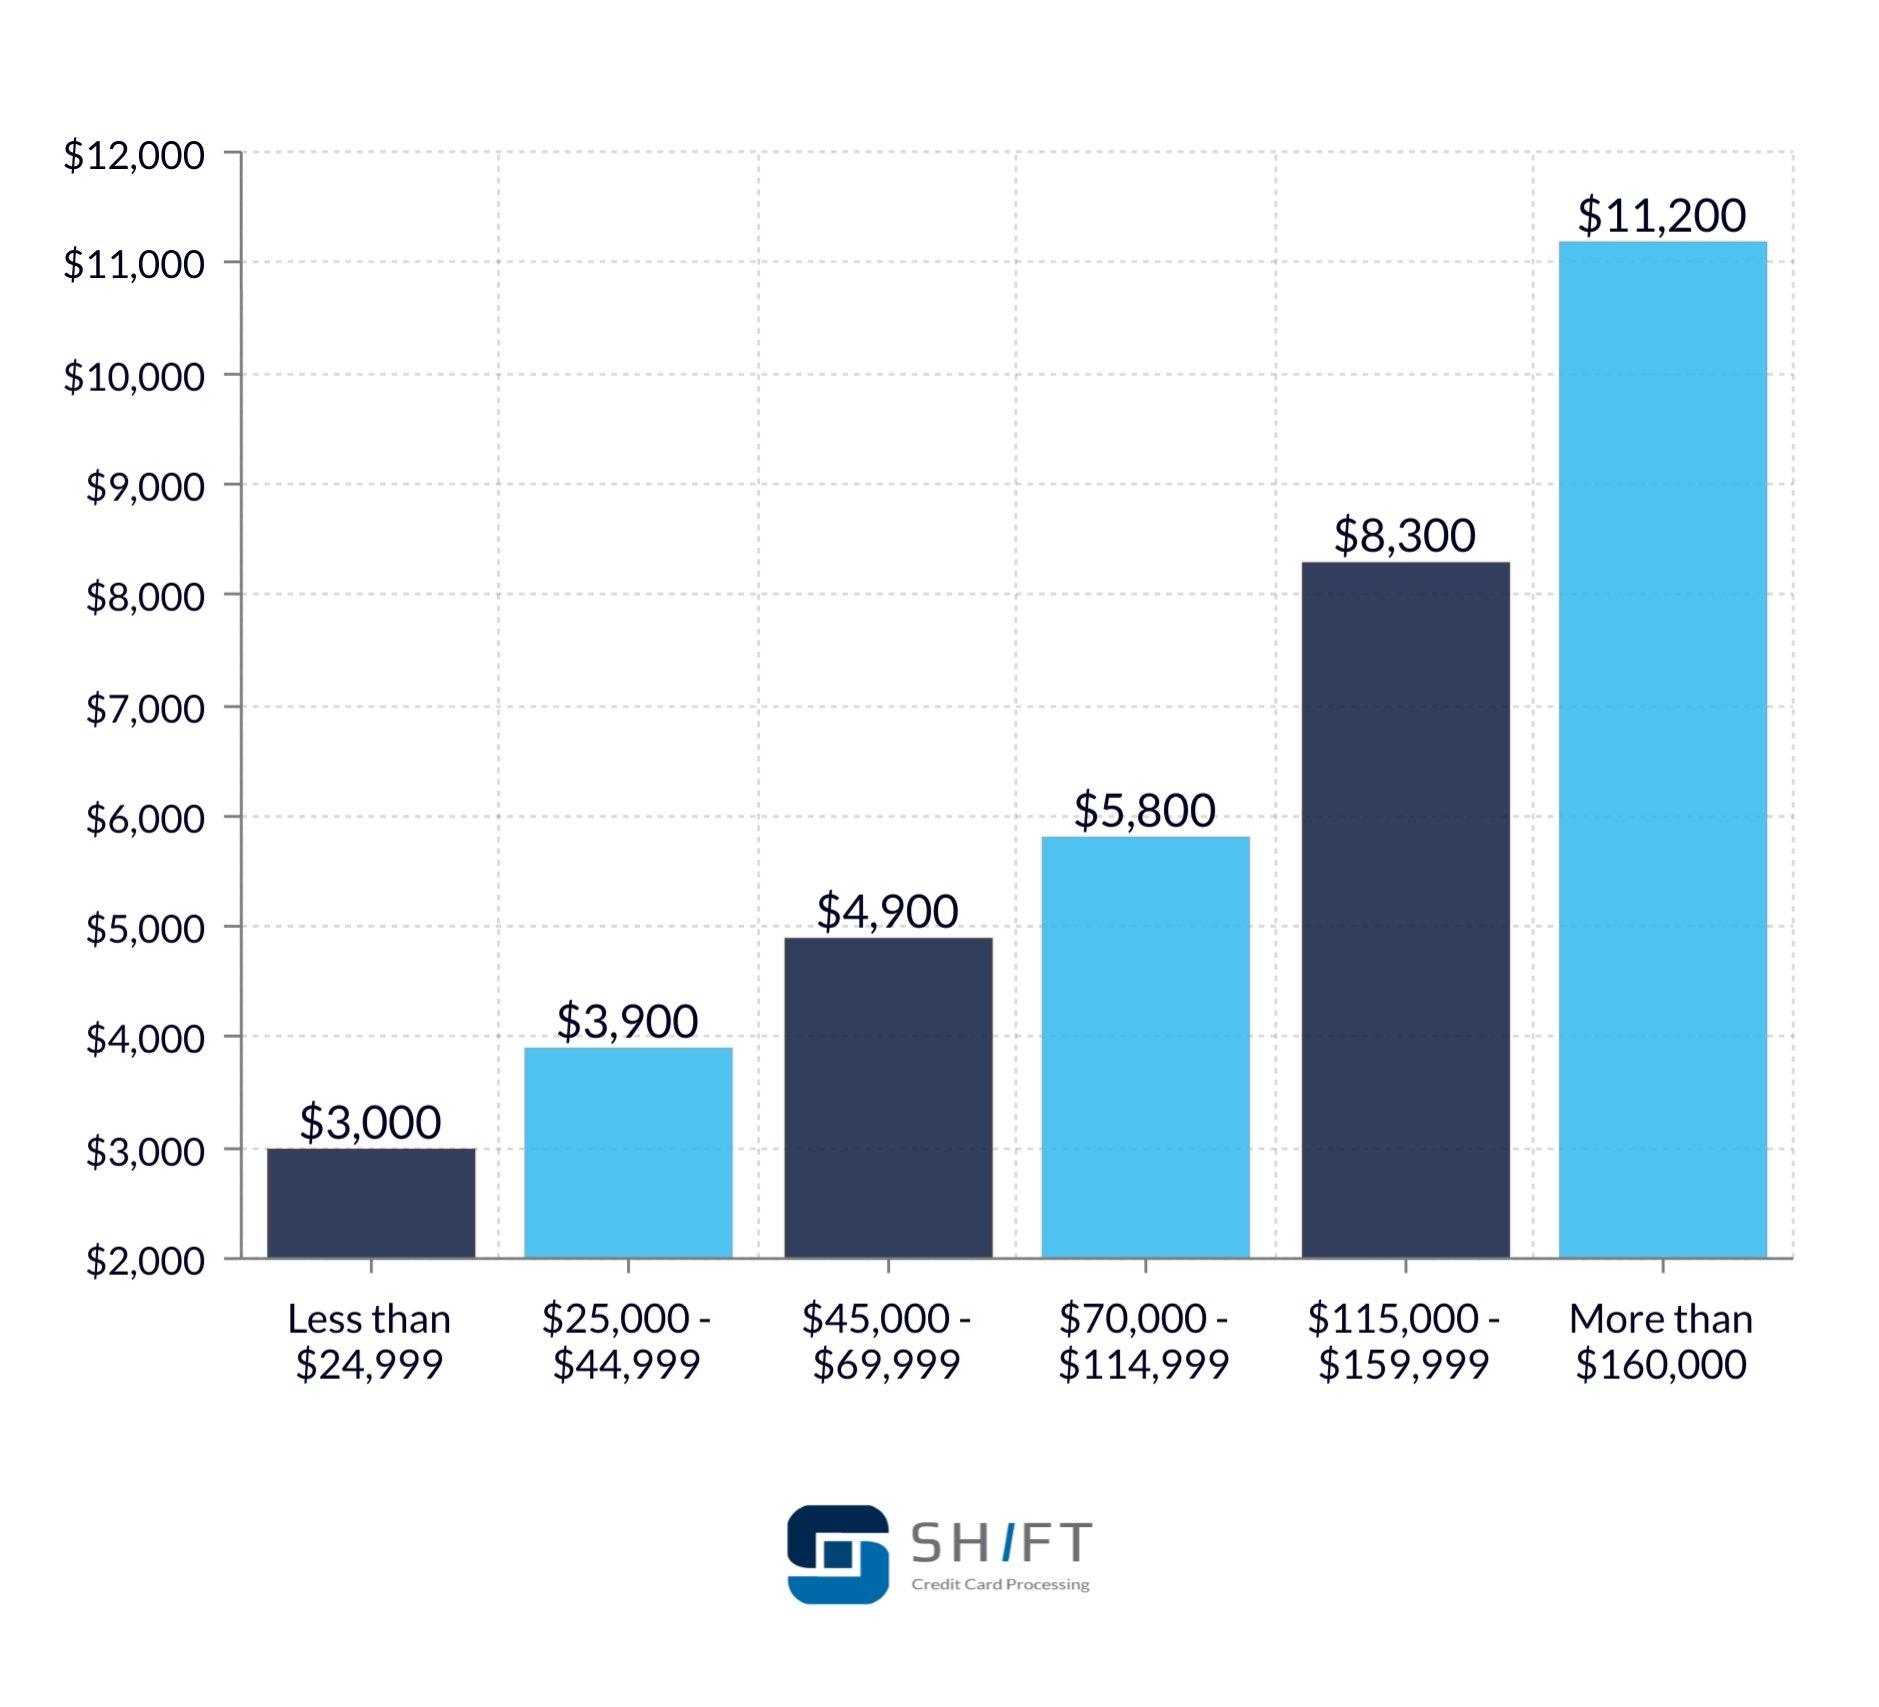 https://shiftprocessing.com/wp-content/uploads/2019/09/income-cc-debt.jpg